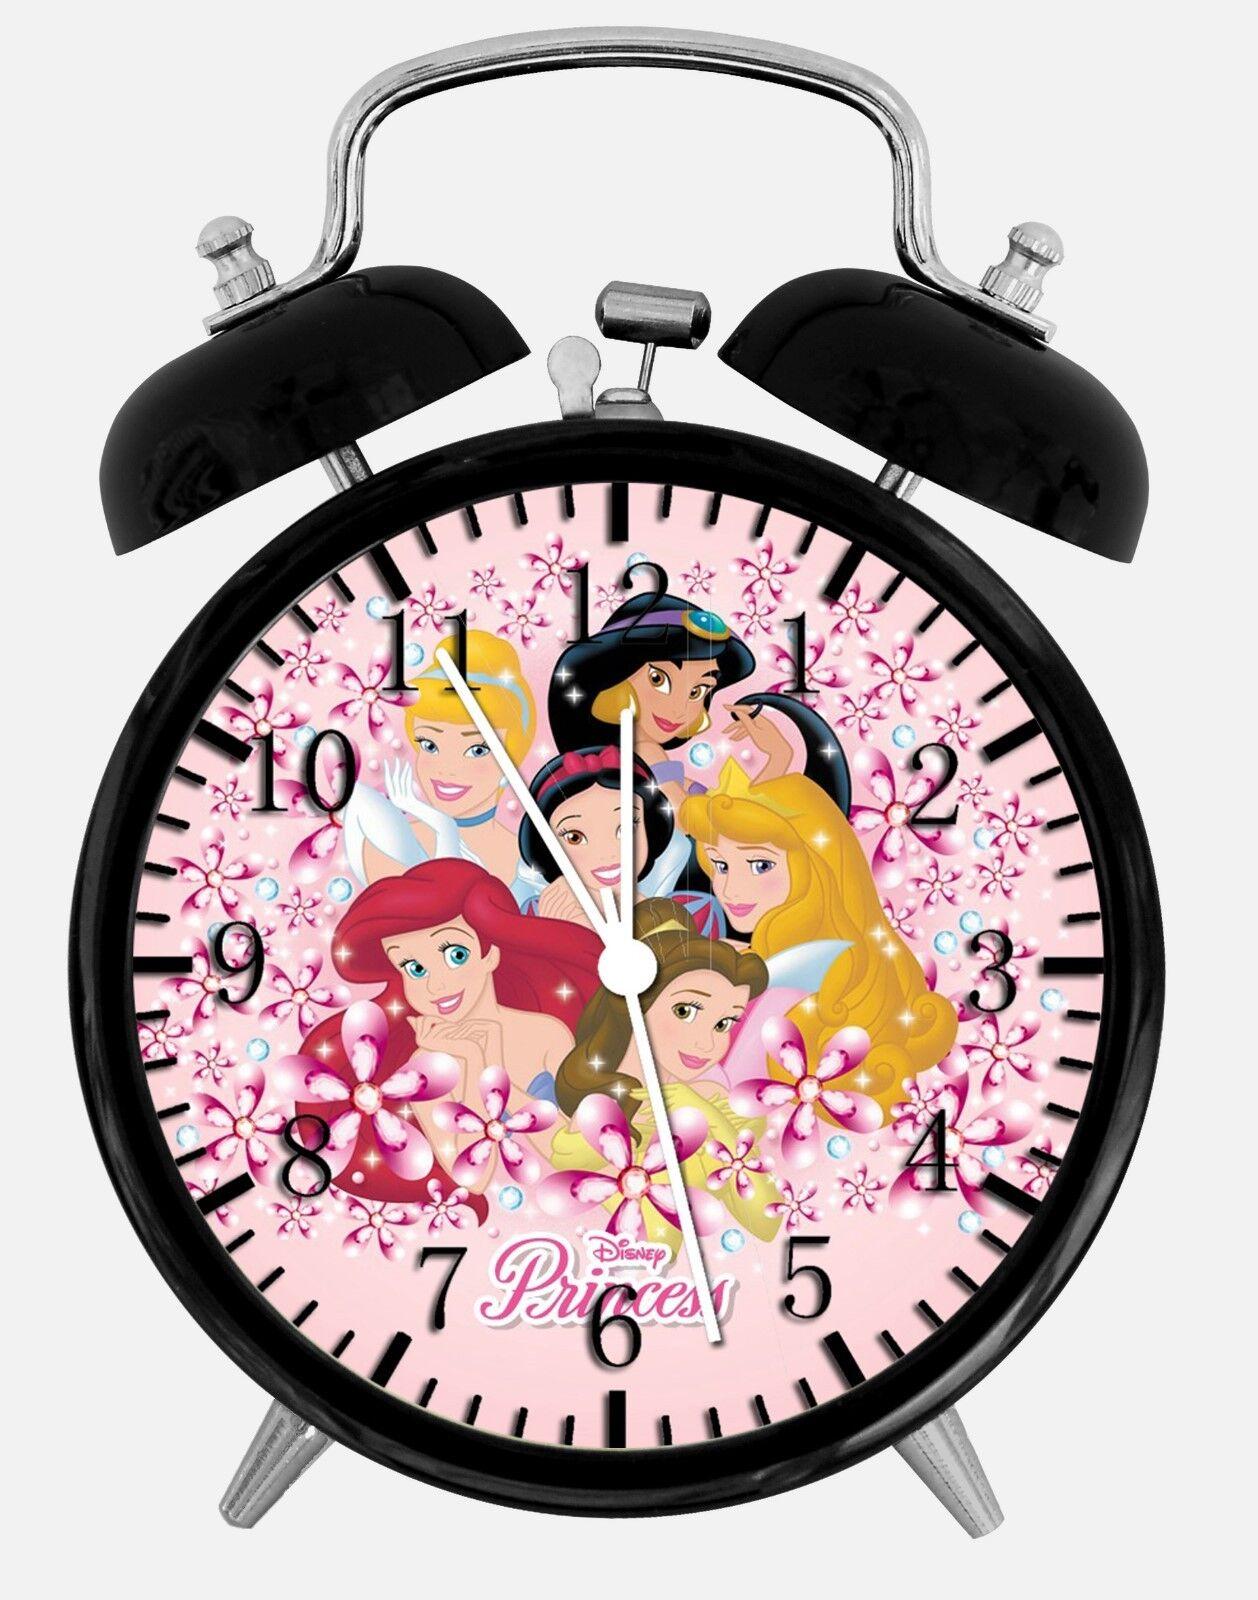 "Disney Princess Alarm Desk Clock 3.75"" Home or Office Decor W236 Nice For Gift"